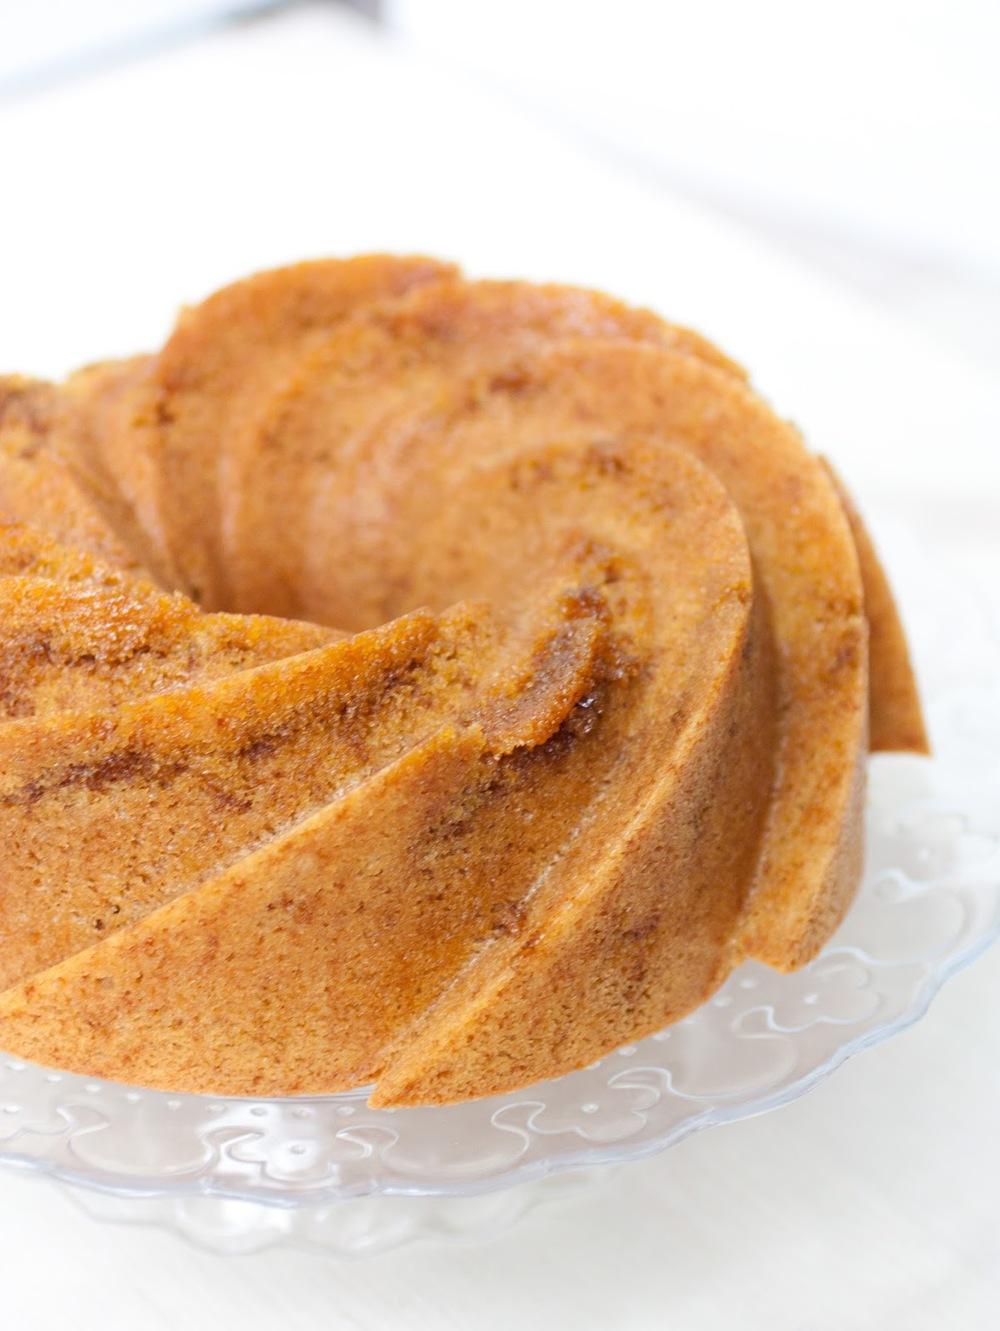 Spiced-bundt-cake-6.jpg